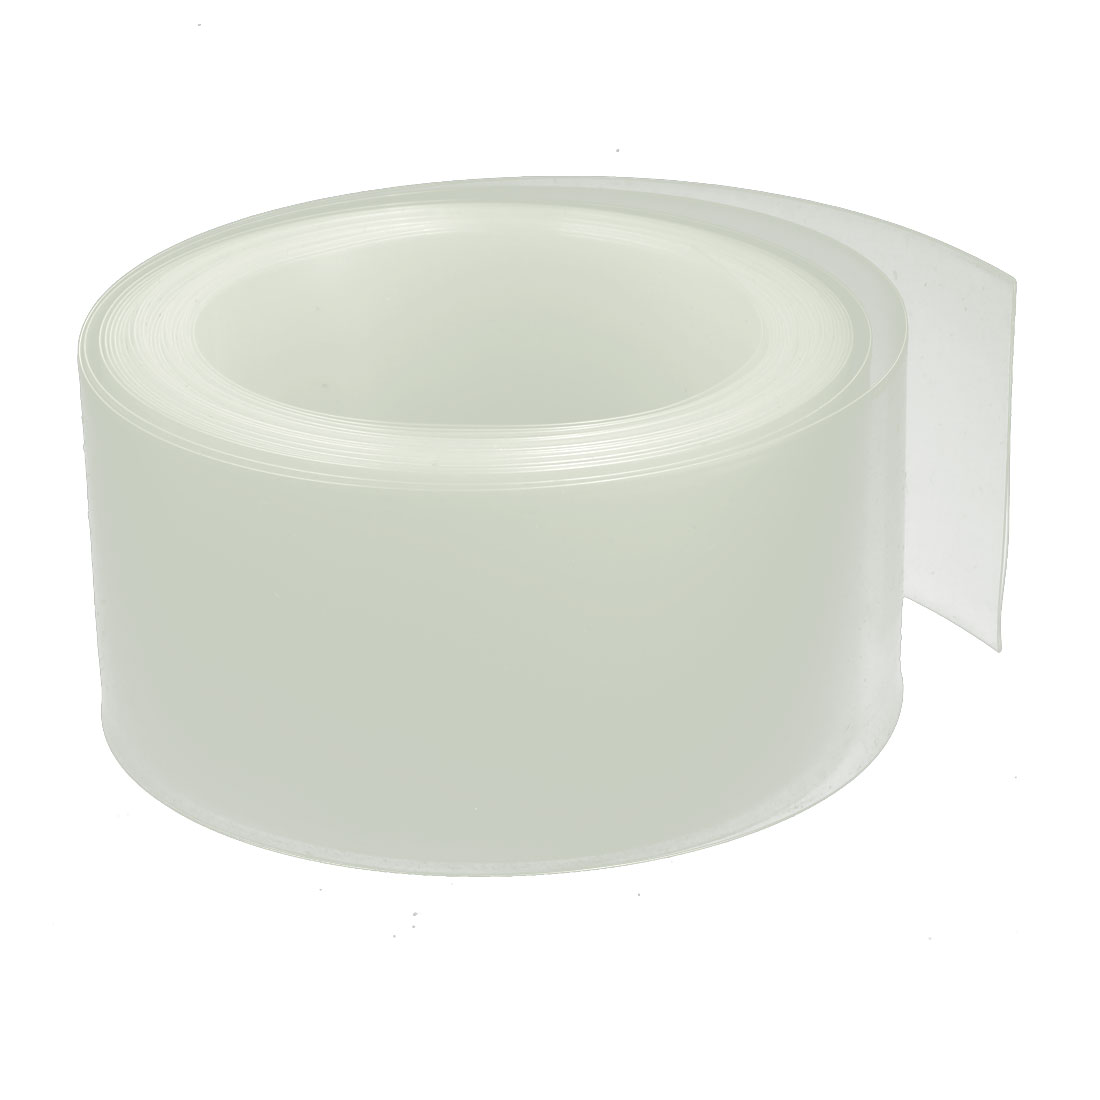 40mm Flat Width 5M Length PVC Heat Shrinkable Tube Clear for 2xAA 9V Battery